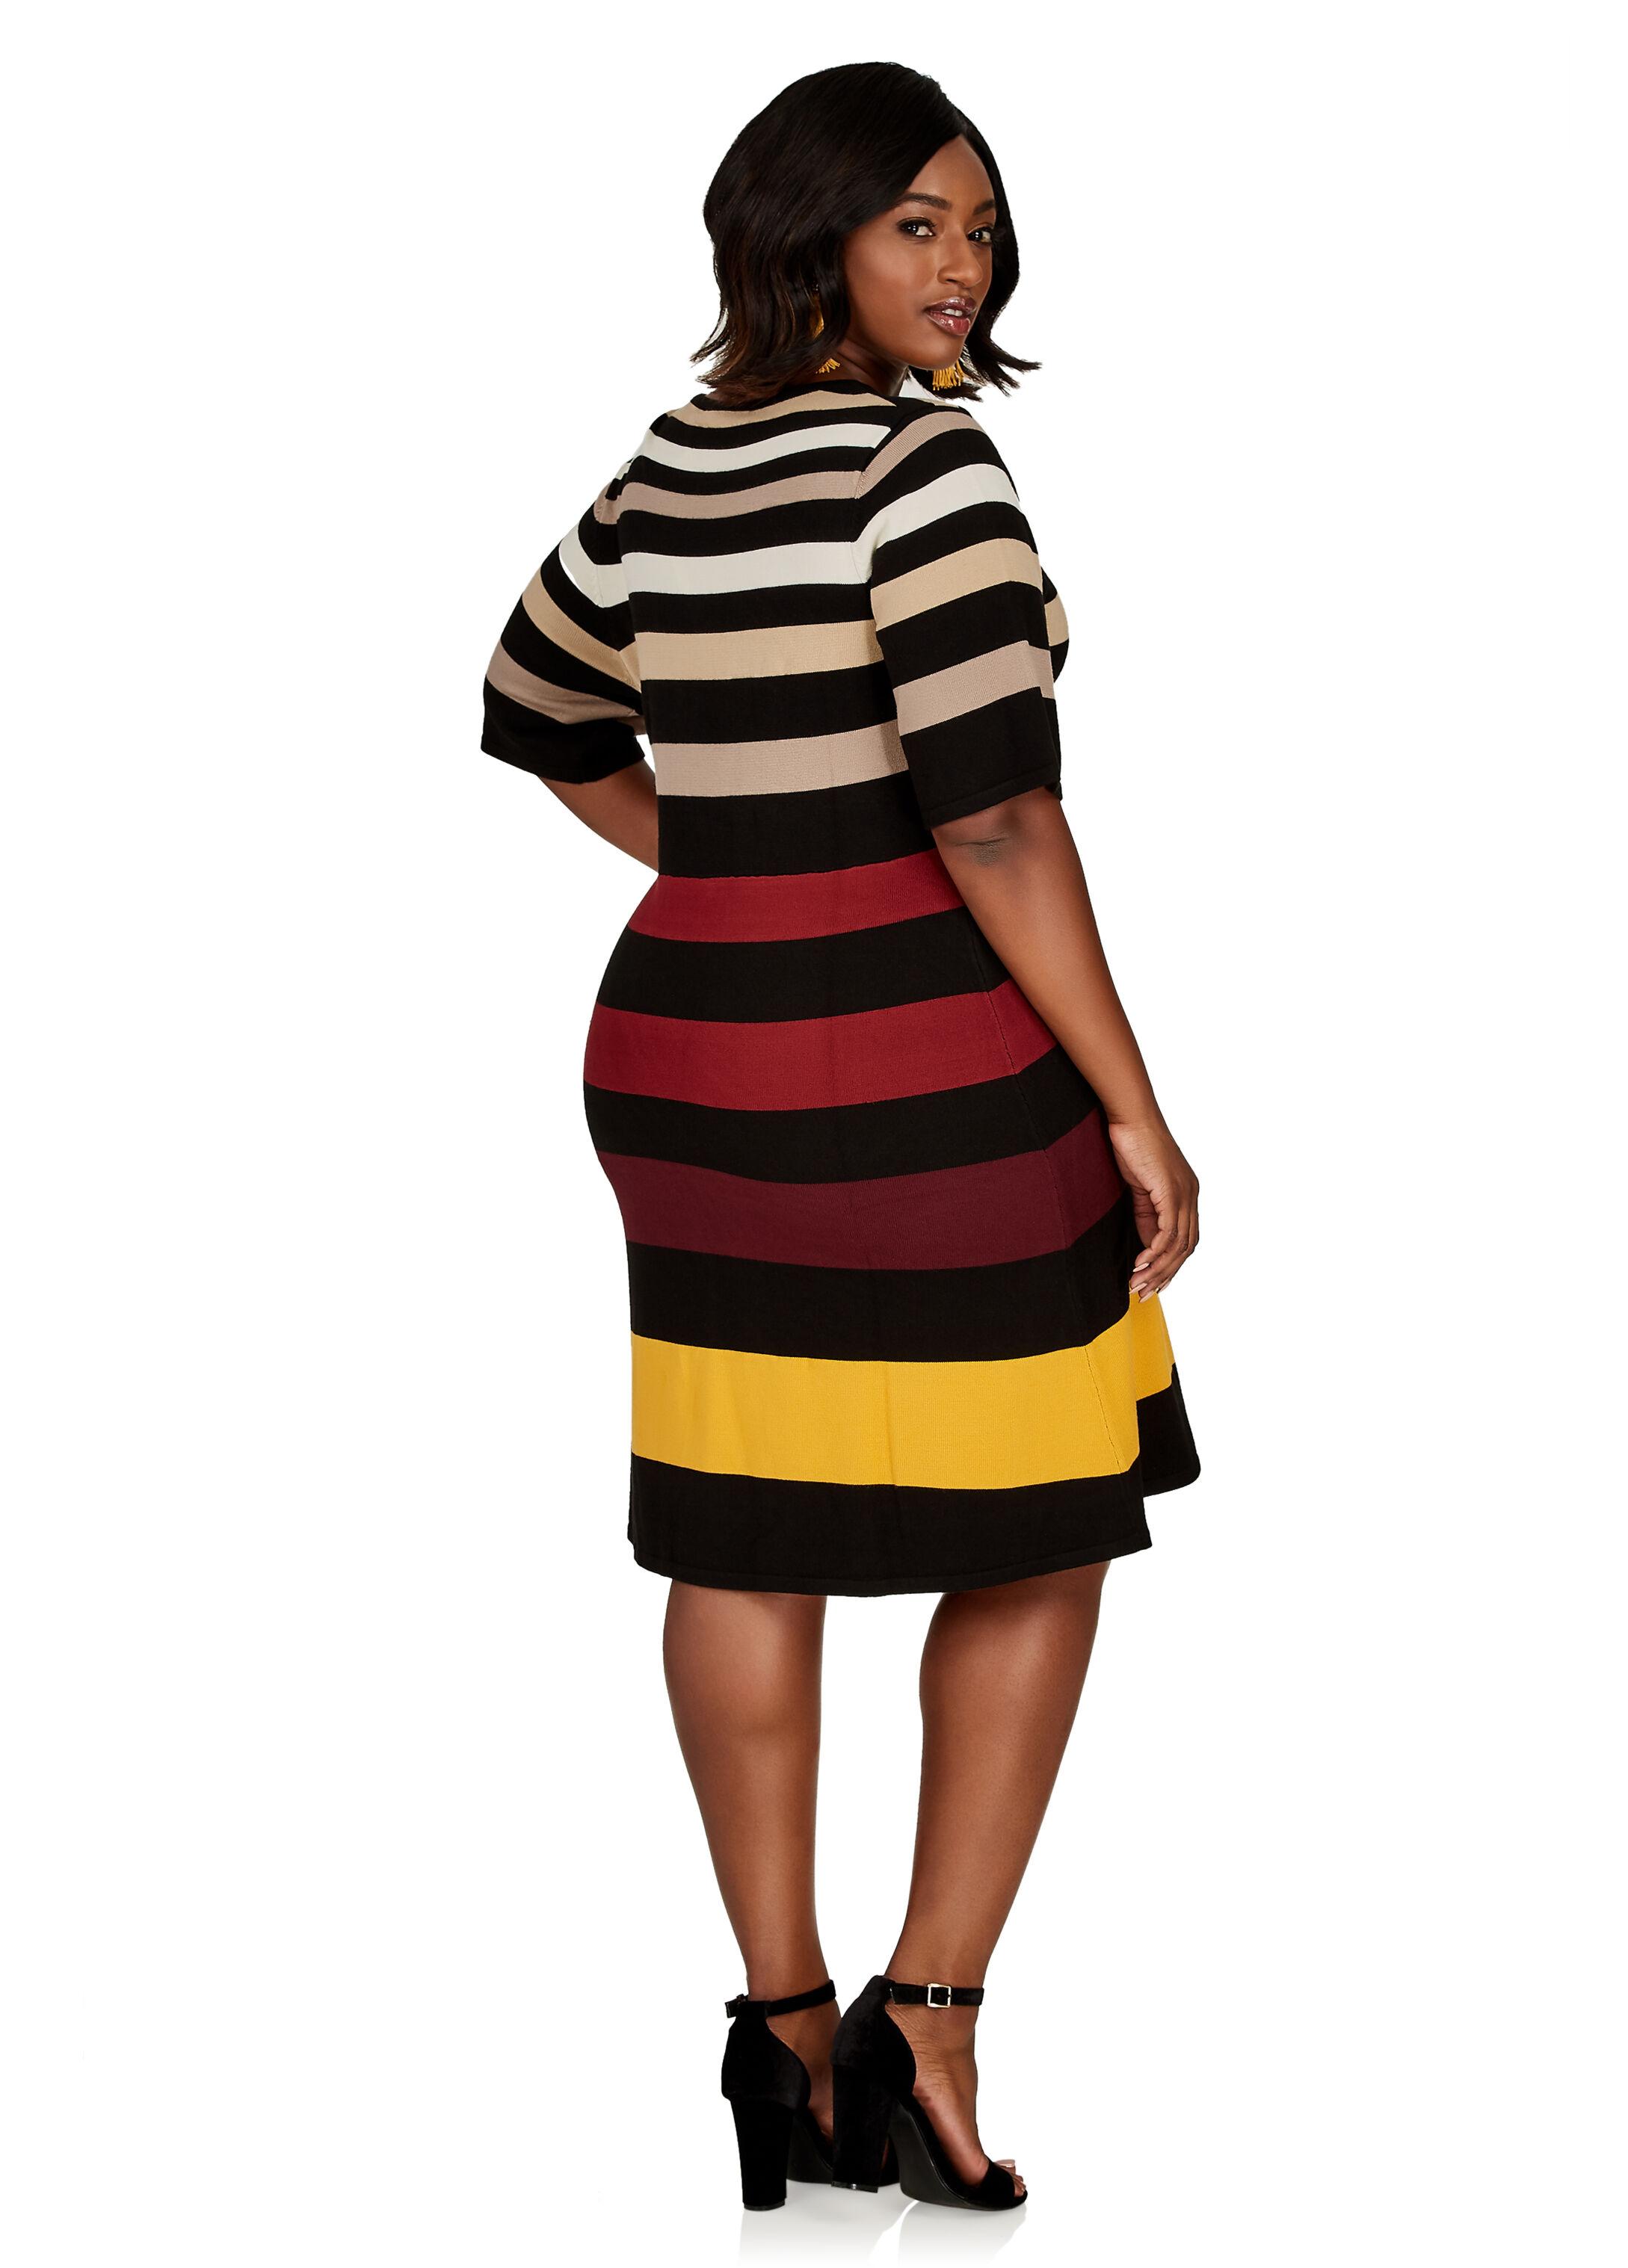 Plus Size Dress - Striped Sweater Dress